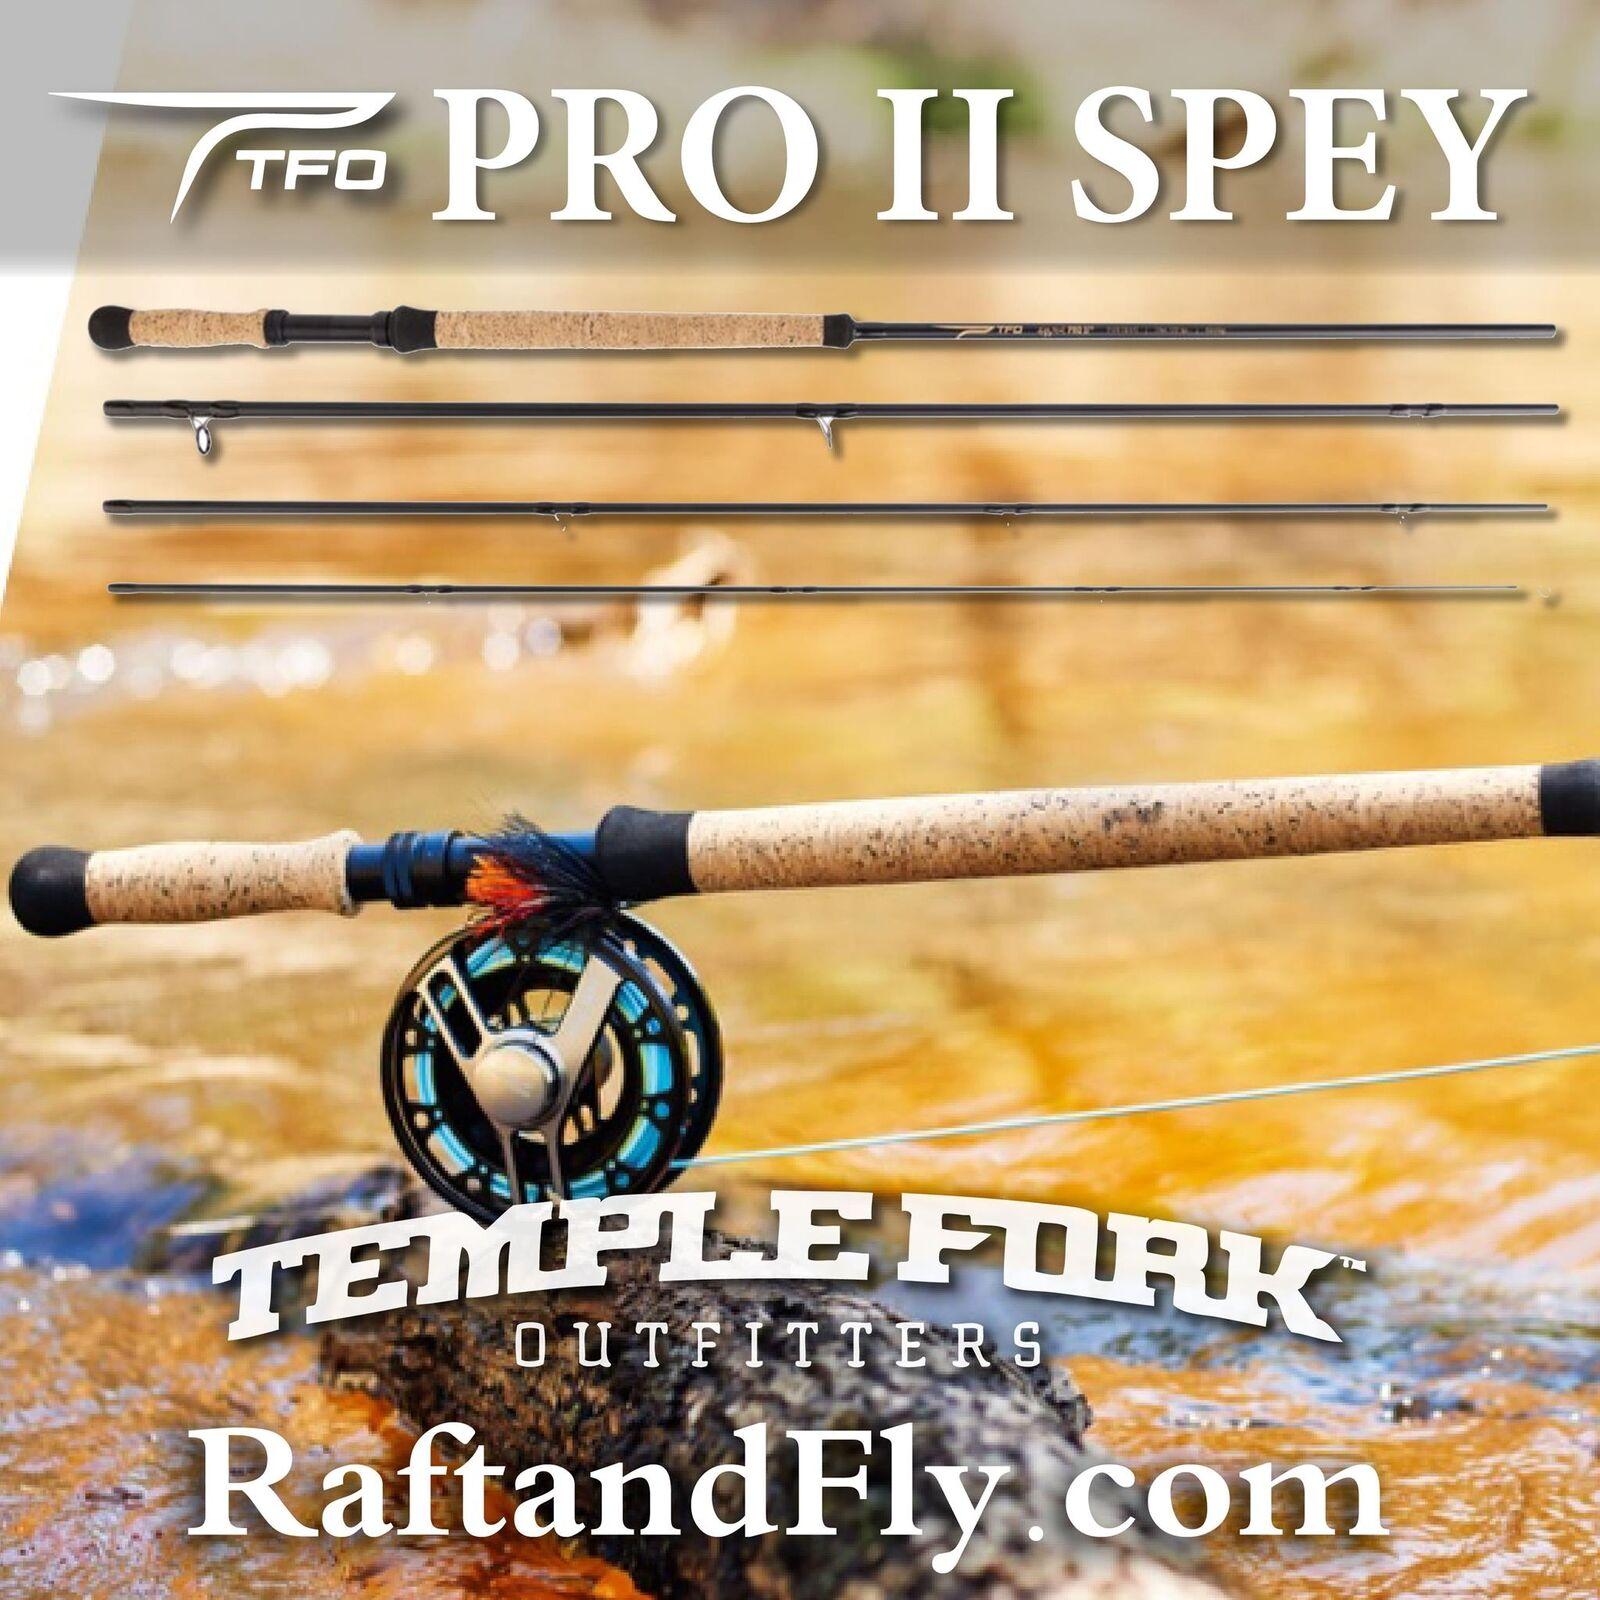 TFO Pro II Spey 7 8wt - Lifetime  Warranty - FREE SHIPPING  more order